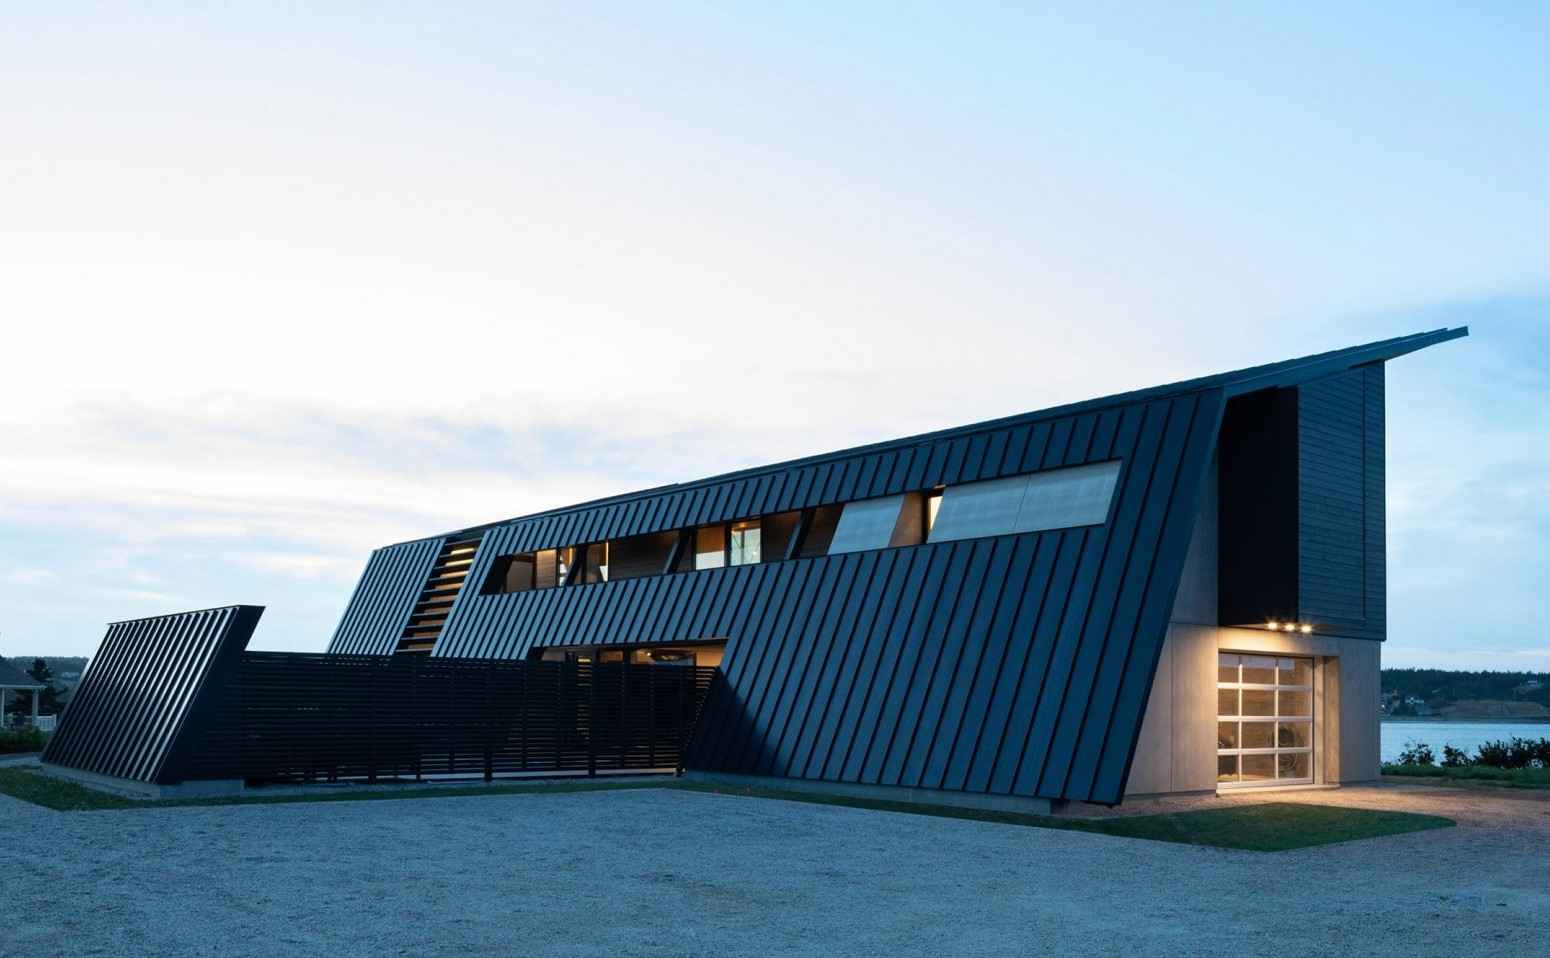 treow-brycg-omar-gandhi-architect-architecture-house-nova-scotia-canada_dezeen_2364_hero-1704x959